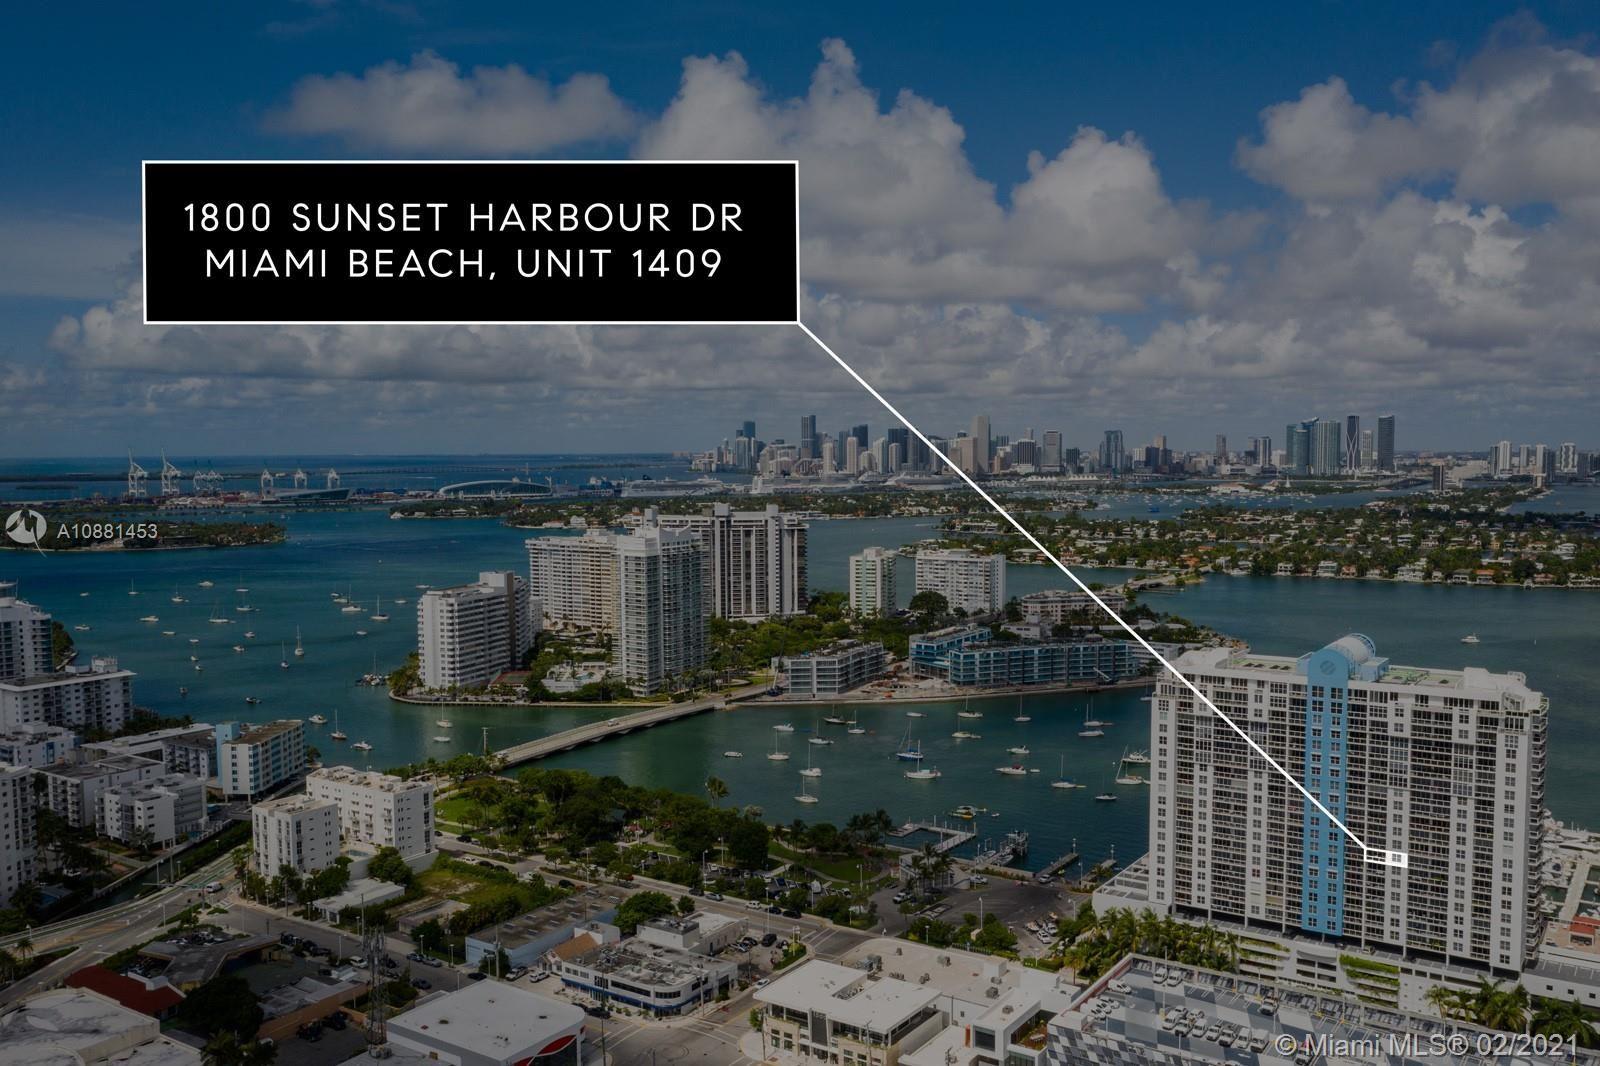 1800 Sunset Harbour Dr #1409, Miami Beach, FL 33139 - #: A10881453